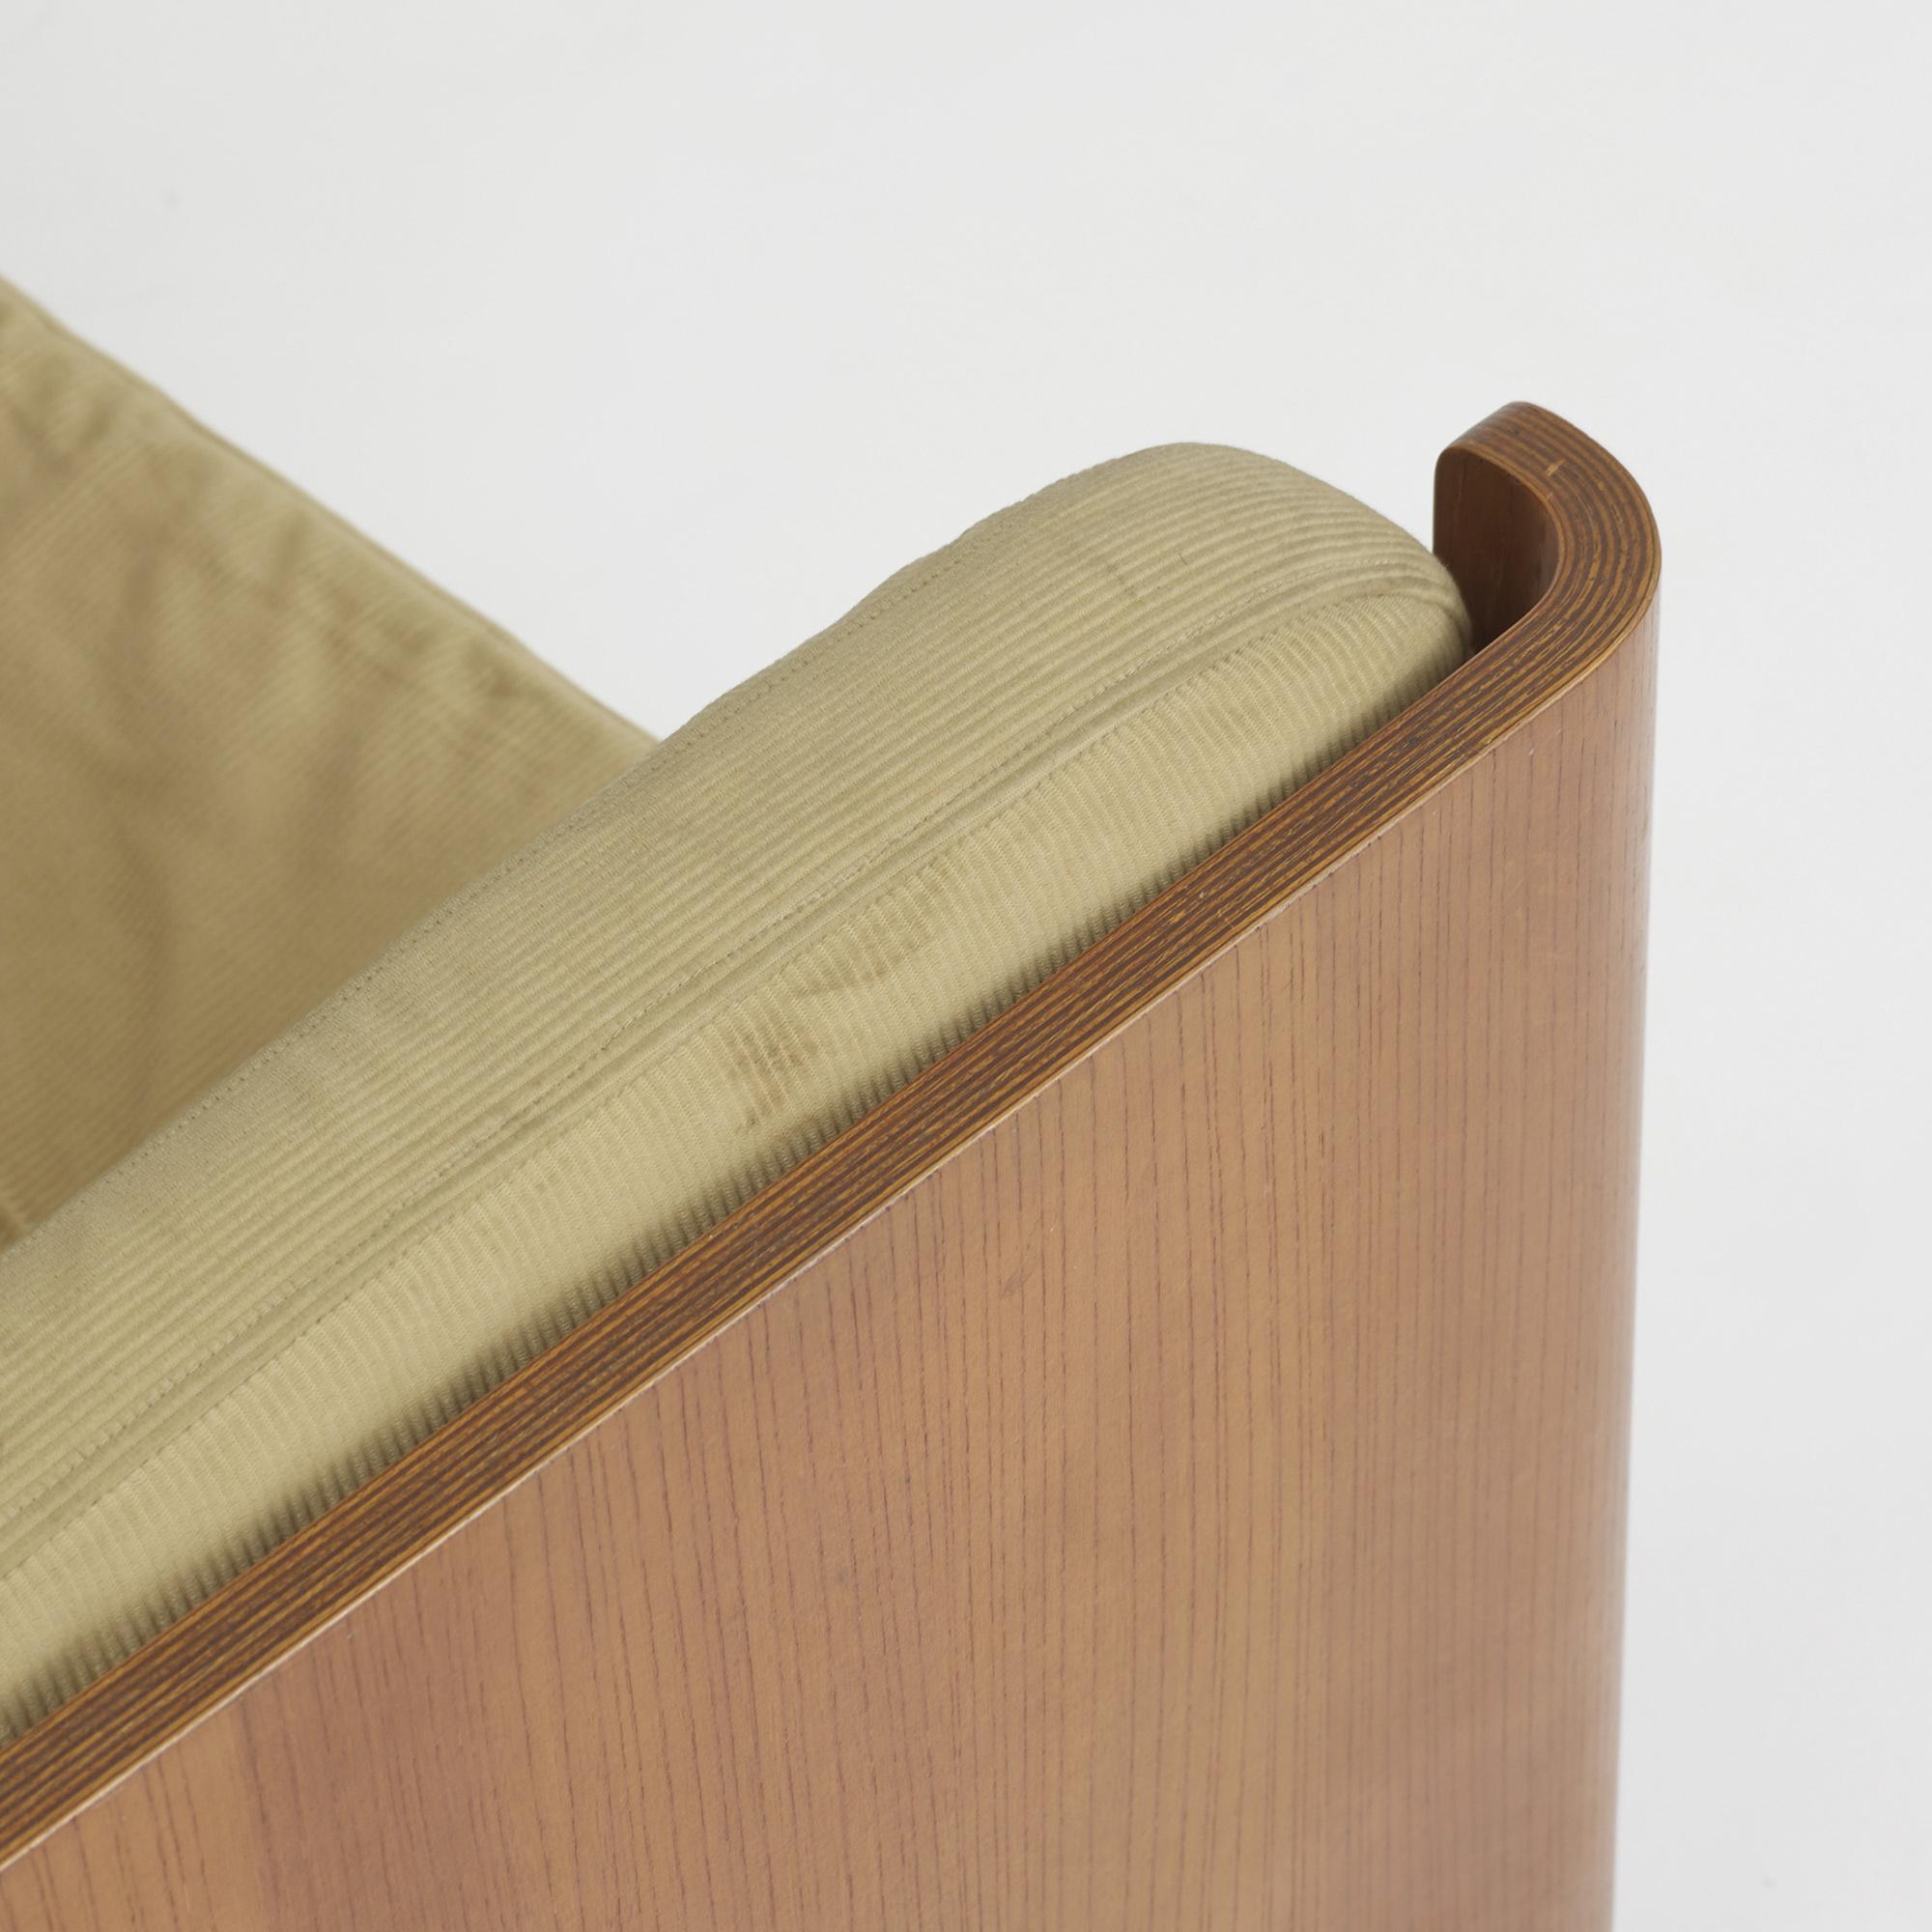 385: Isamu Kenmochi / lounge chair (3 of 3)